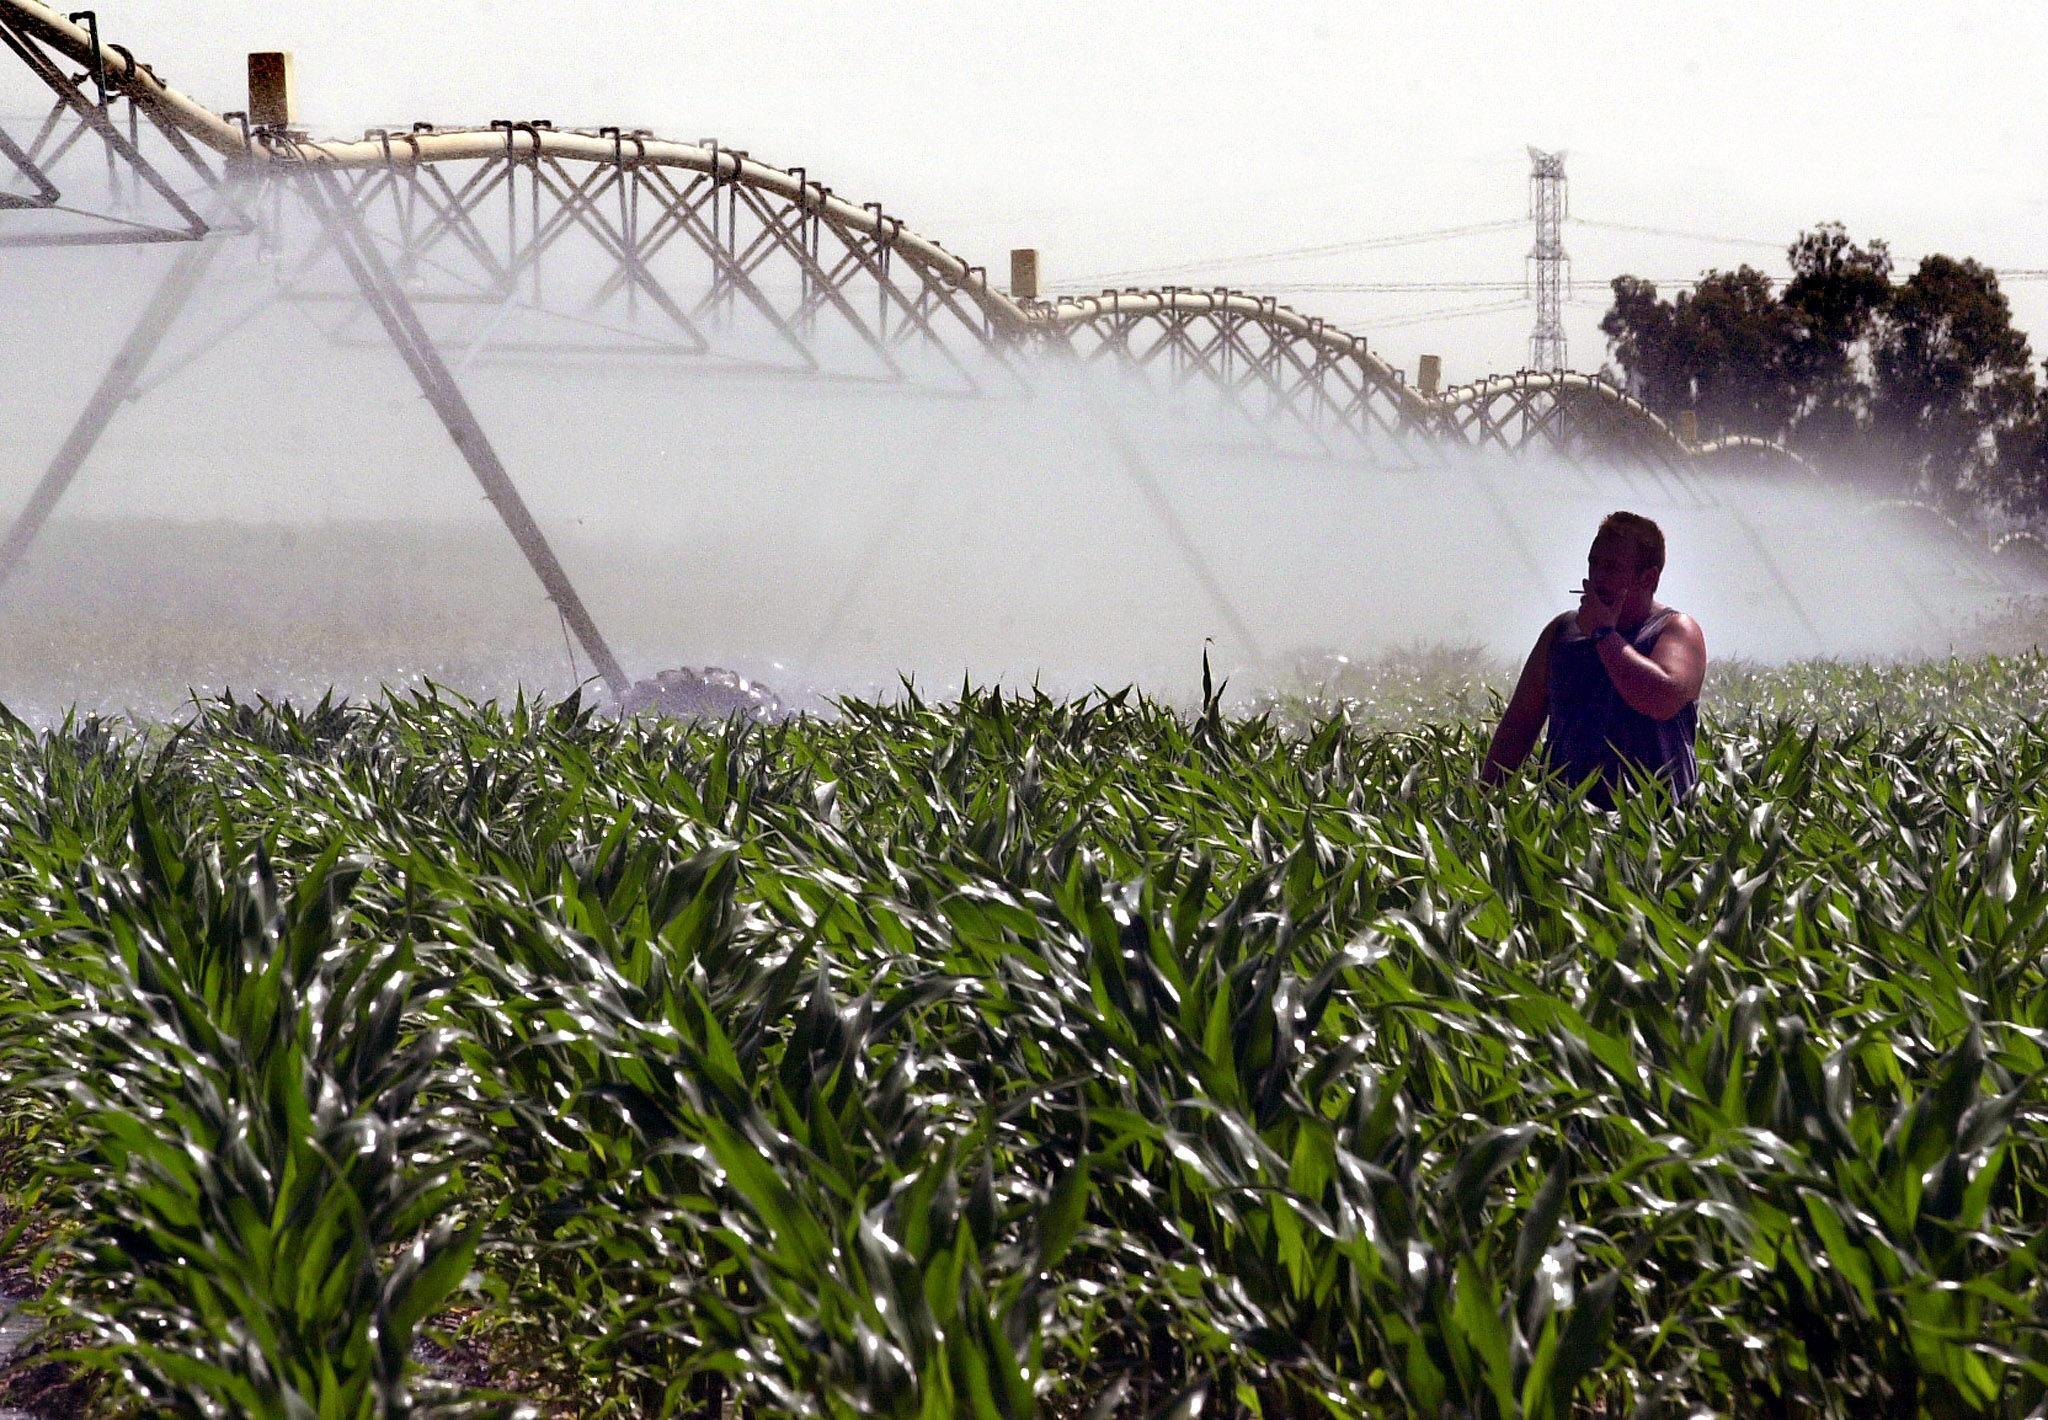 Un operario controla un sistema de riego en una finca sembrada de maíz. / EMILIO MORENATTI (EFE)